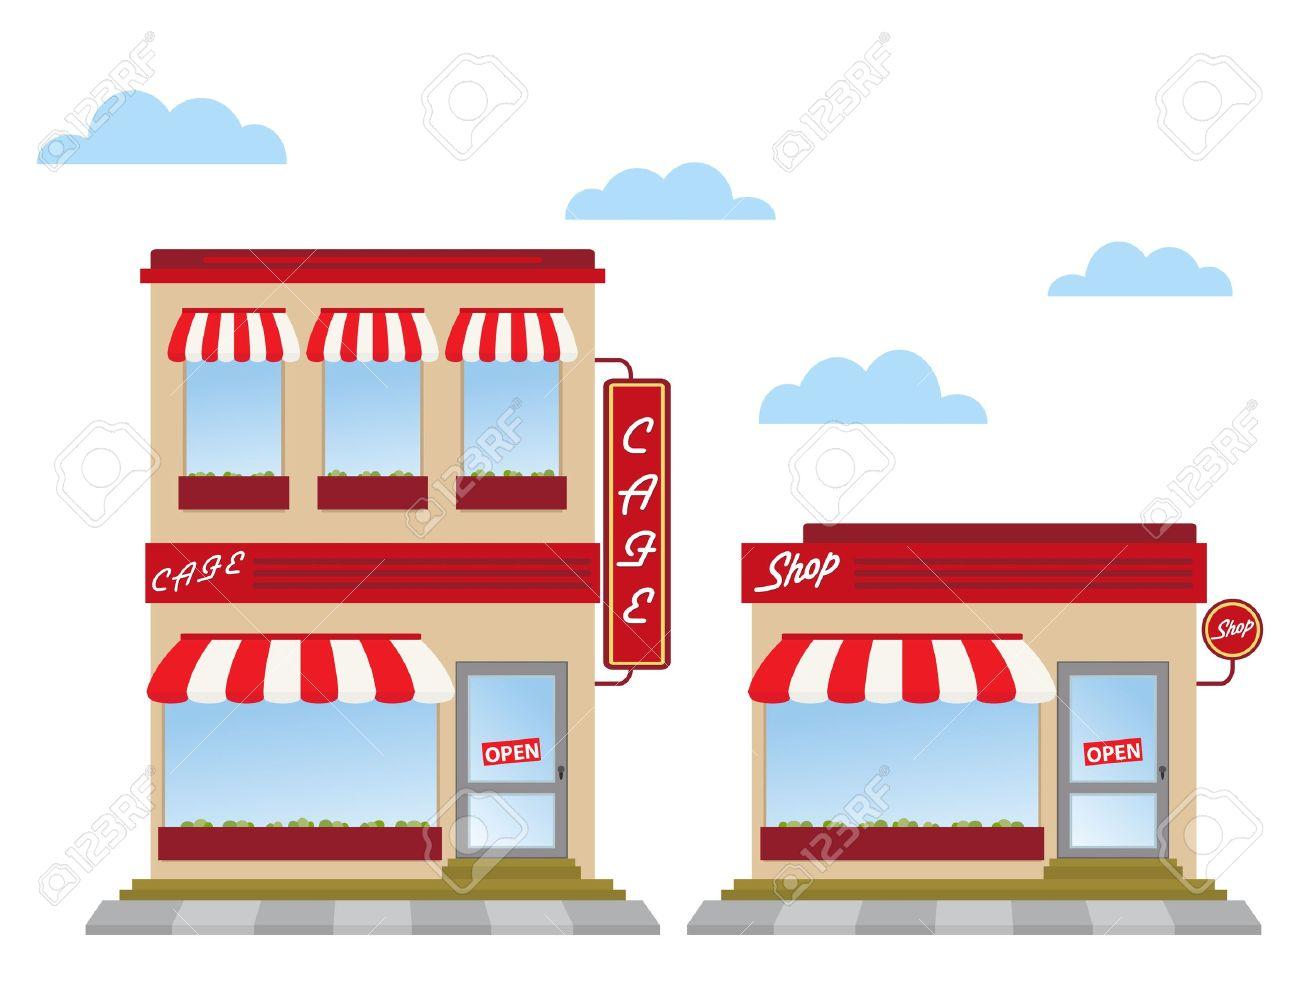 Fancy restaurant buildings clip art - Restaurant Exterior Cafe And Shop Store Fronts